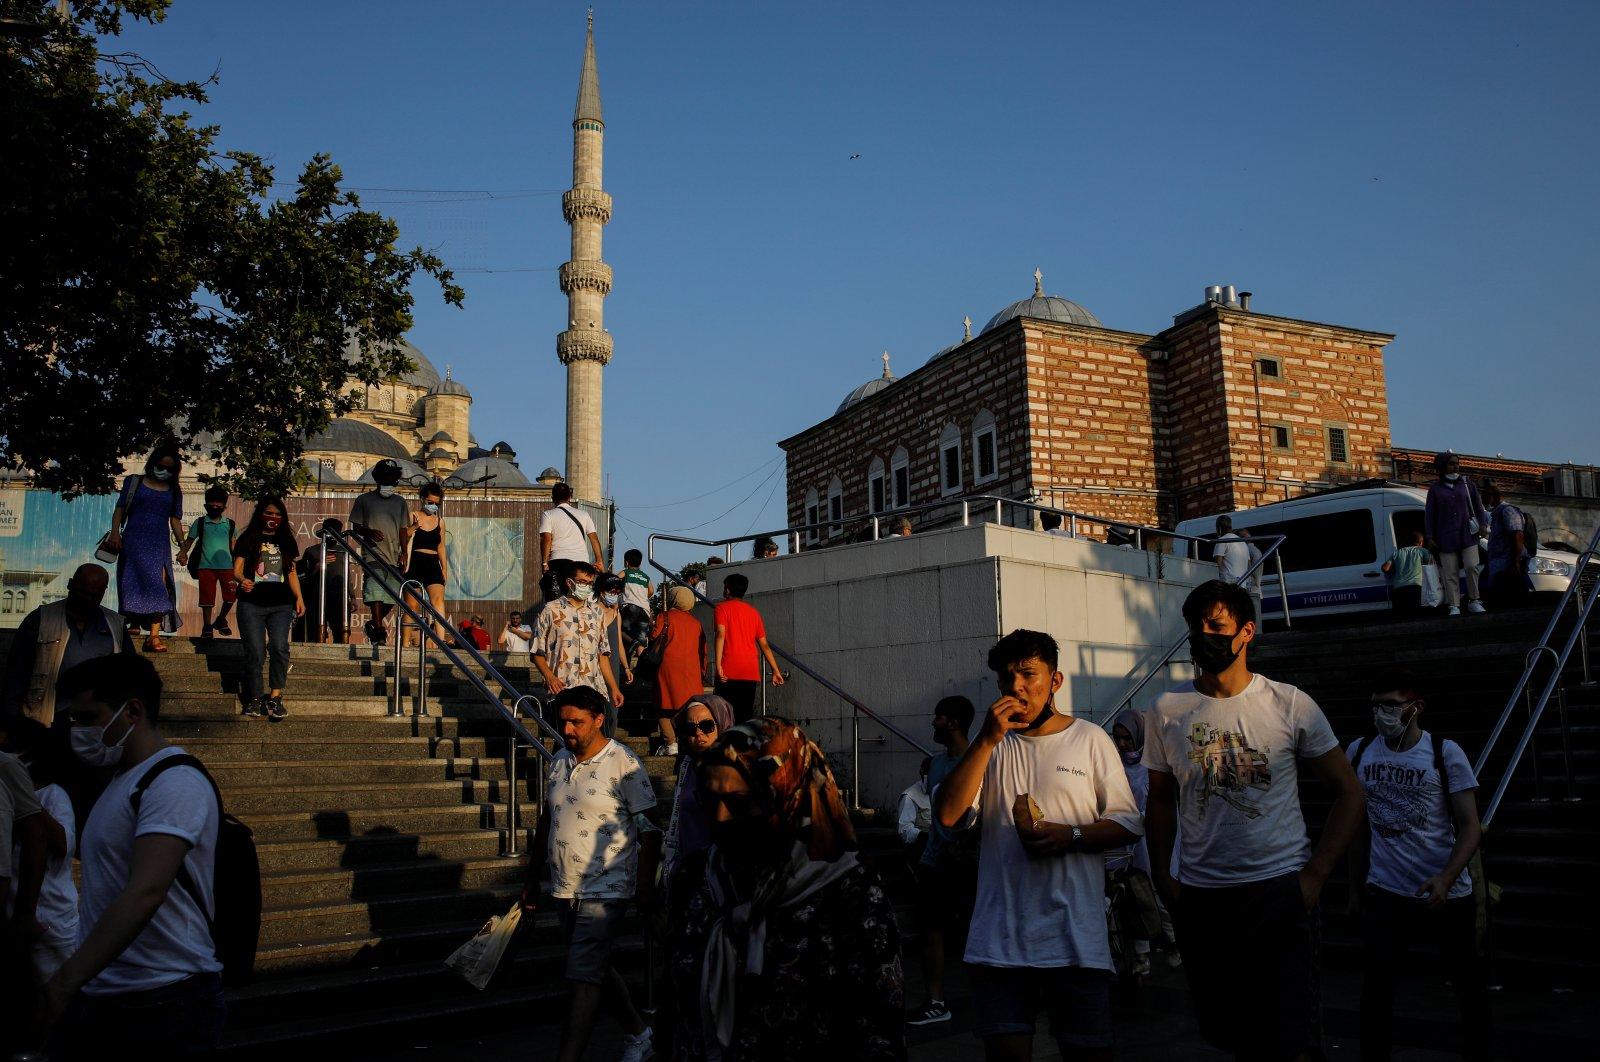 People walk along the Eminönü neighborhood in Istanbul, Turkey, July 12, 2021. (Reuters Photo)